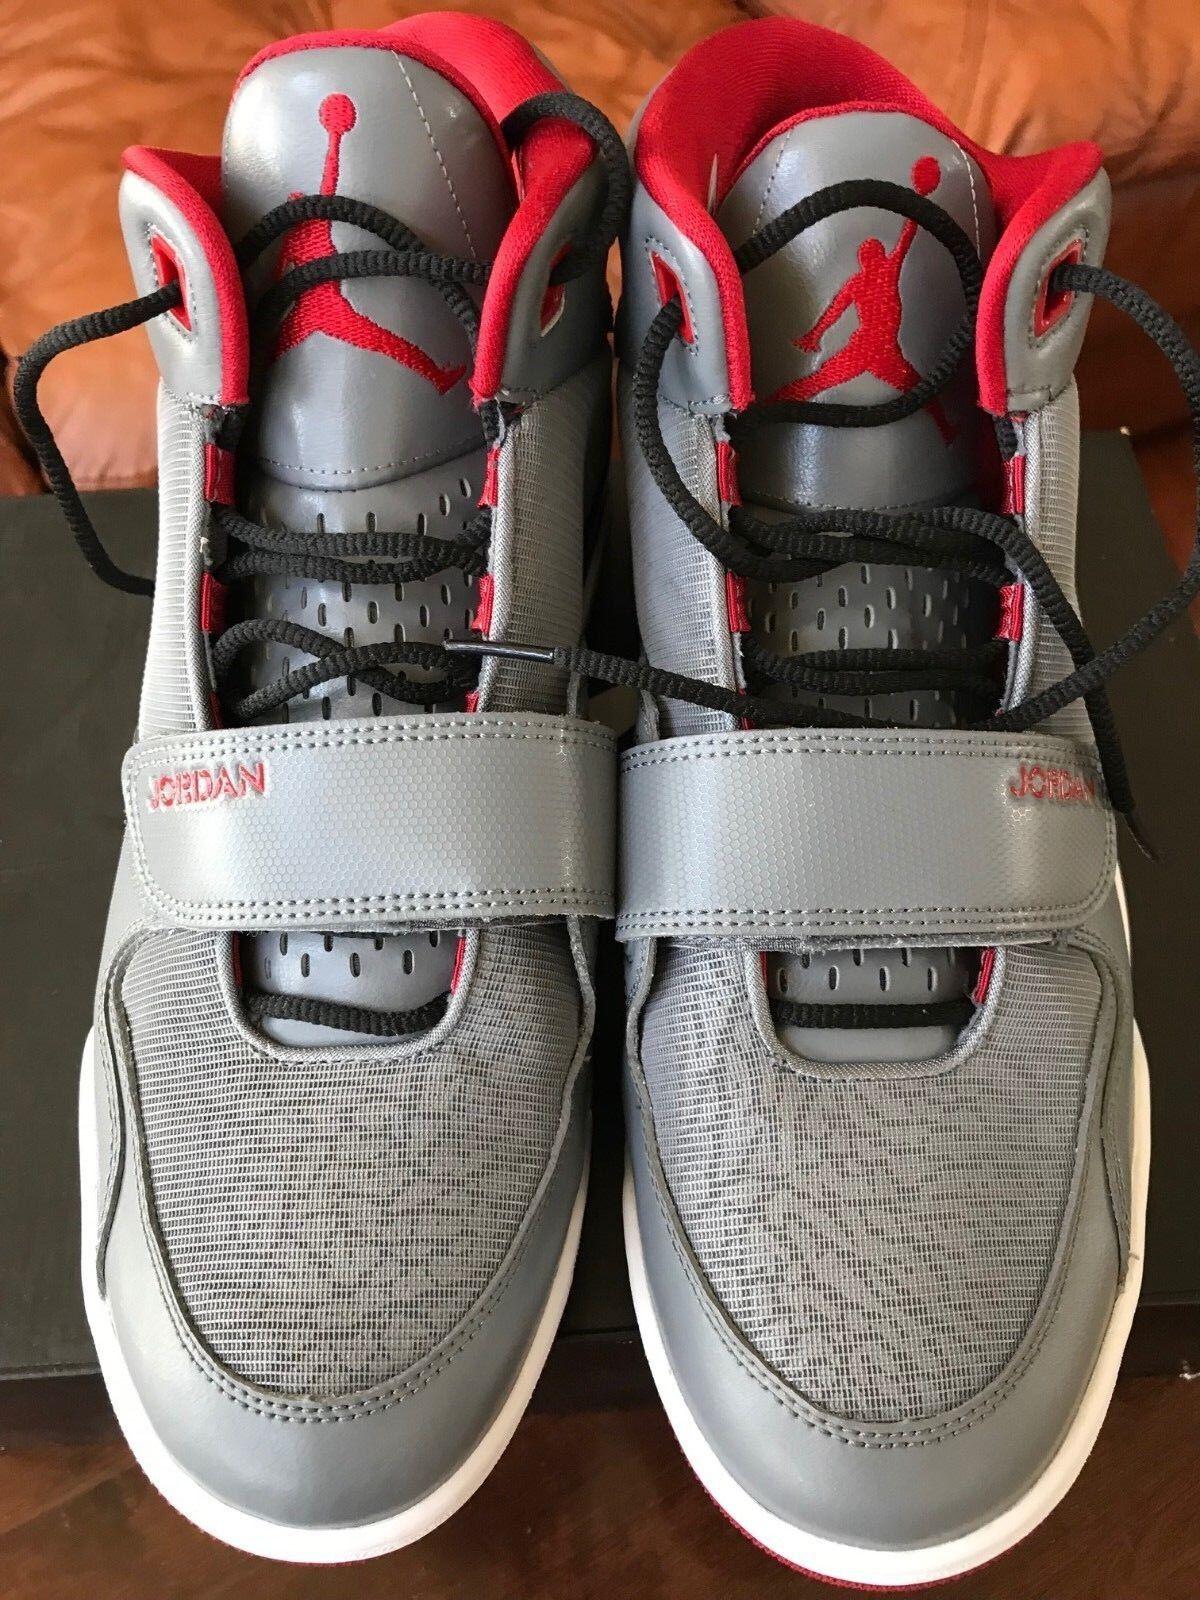 Nike Jordan Fltclb 90's Cool Grey Gym Red Black White 602661 022 SZ11 Origs $120